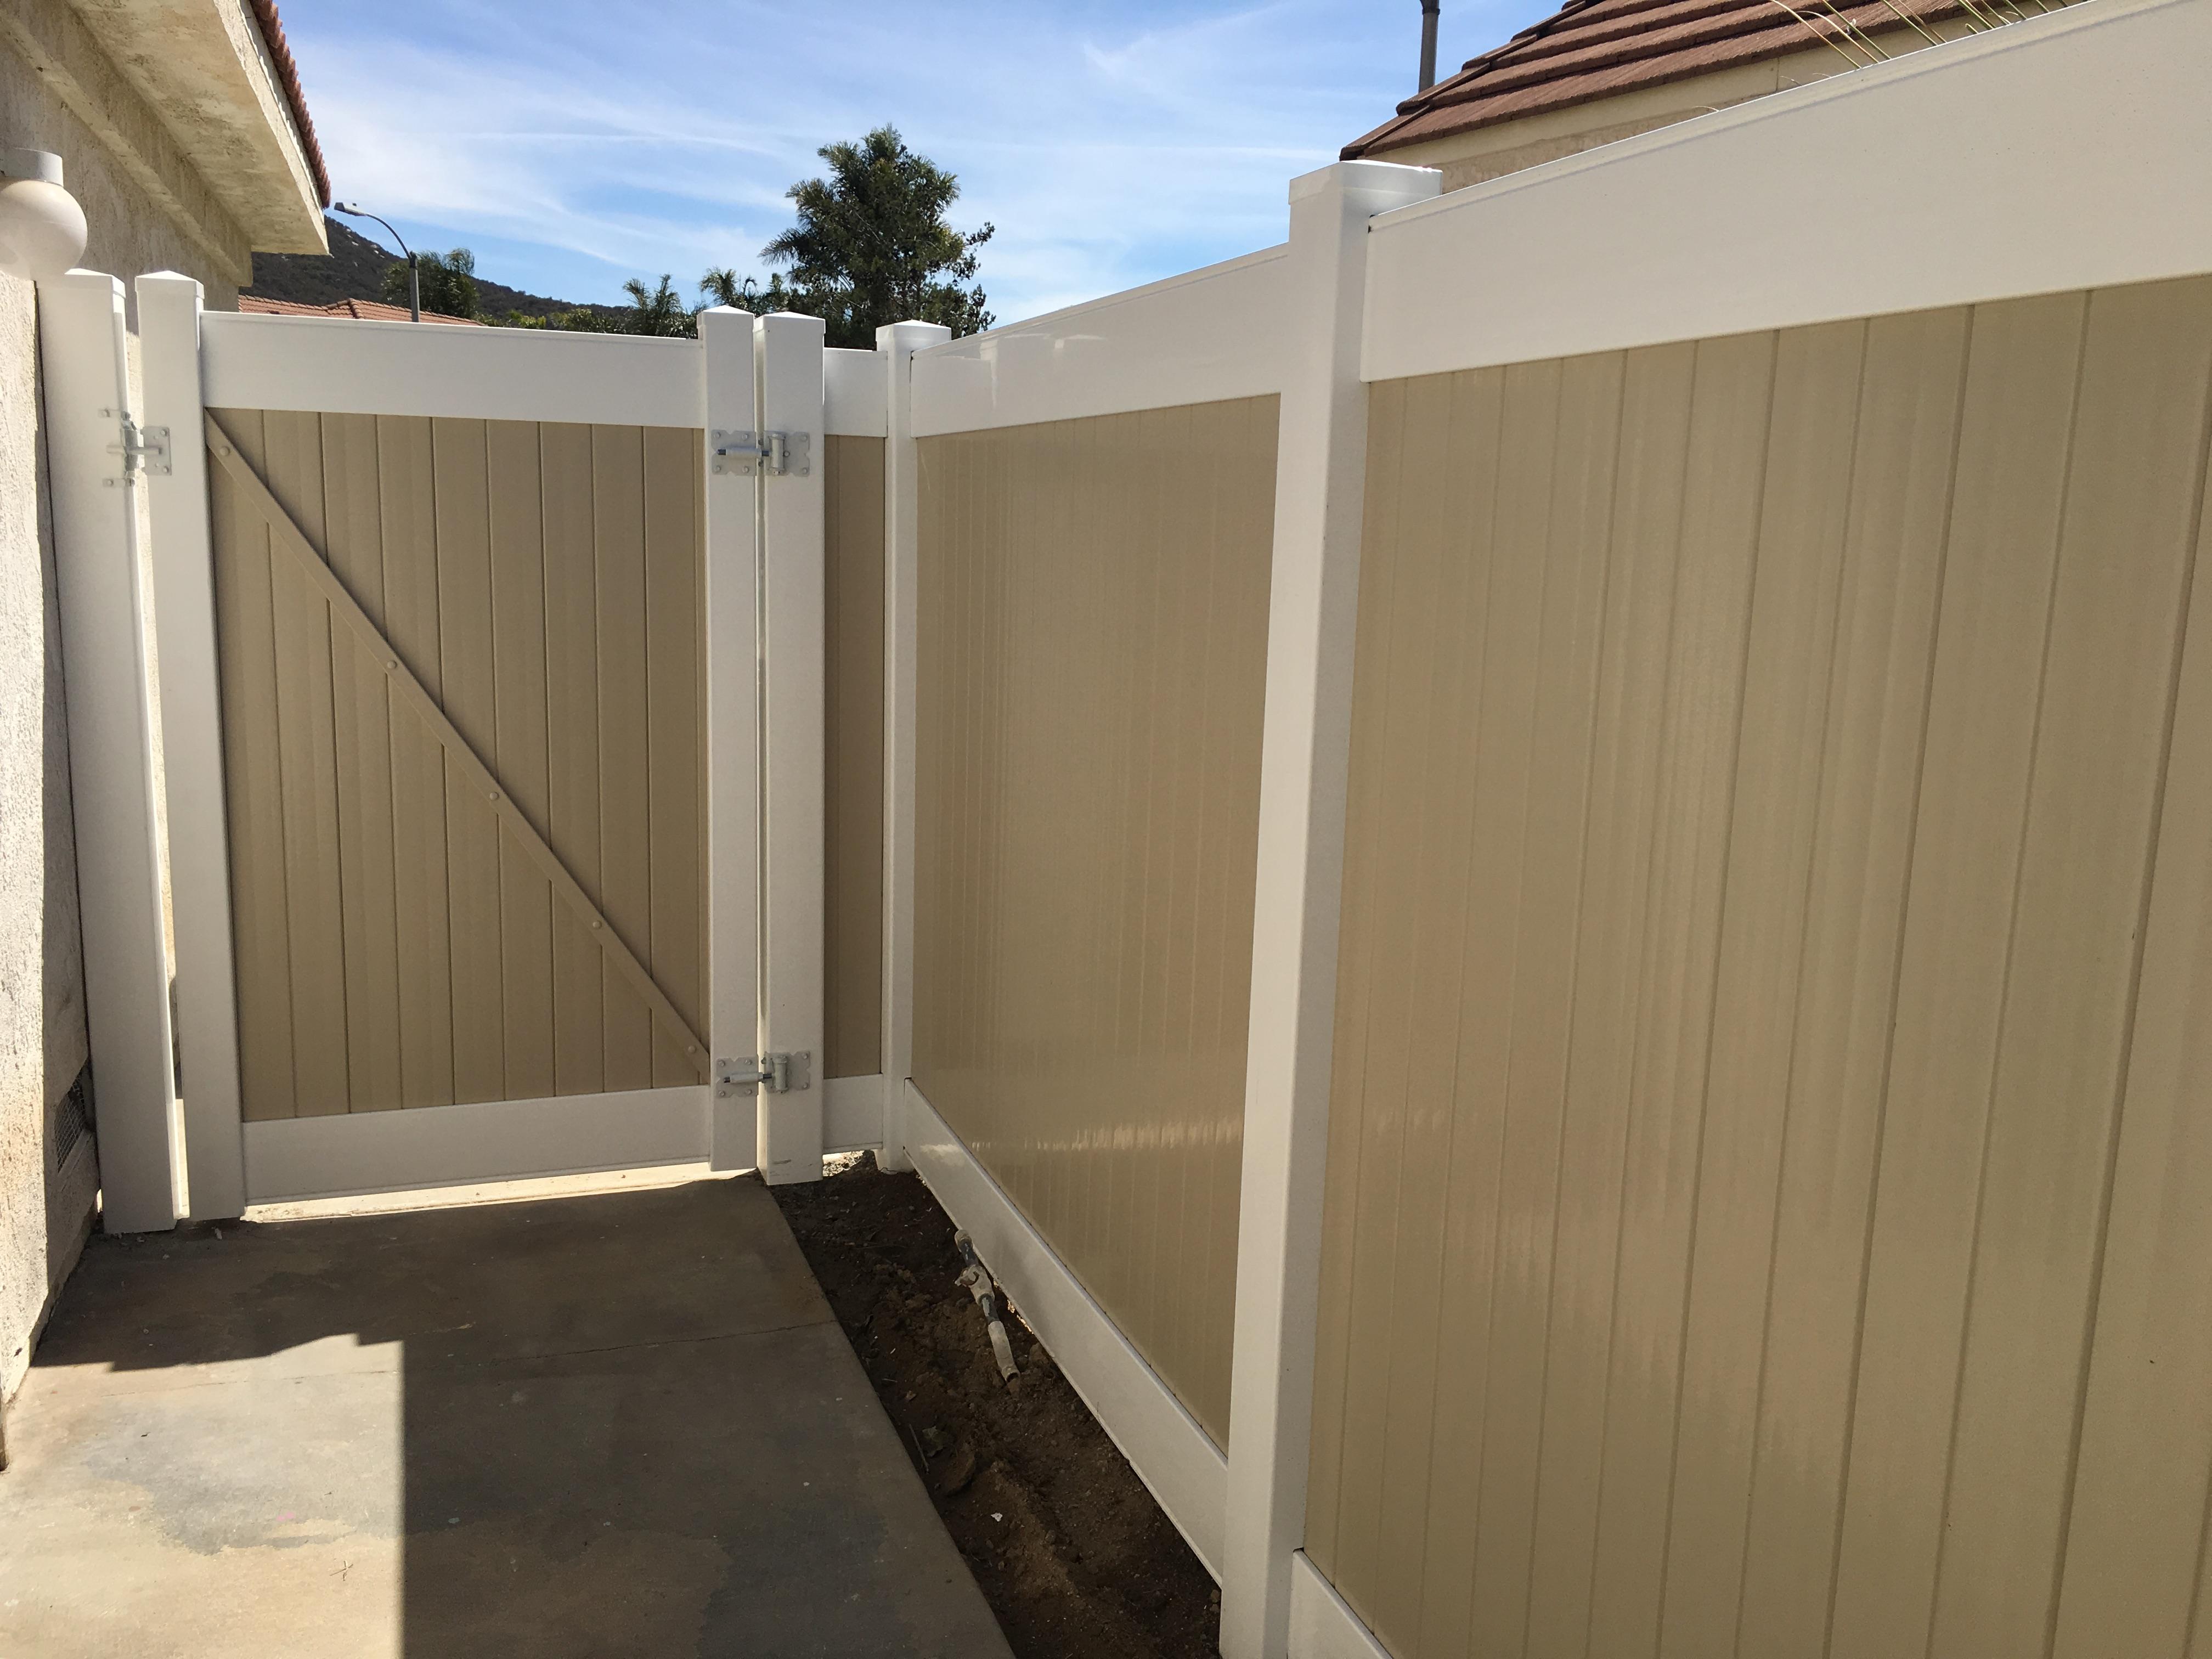 3T Fence image 20